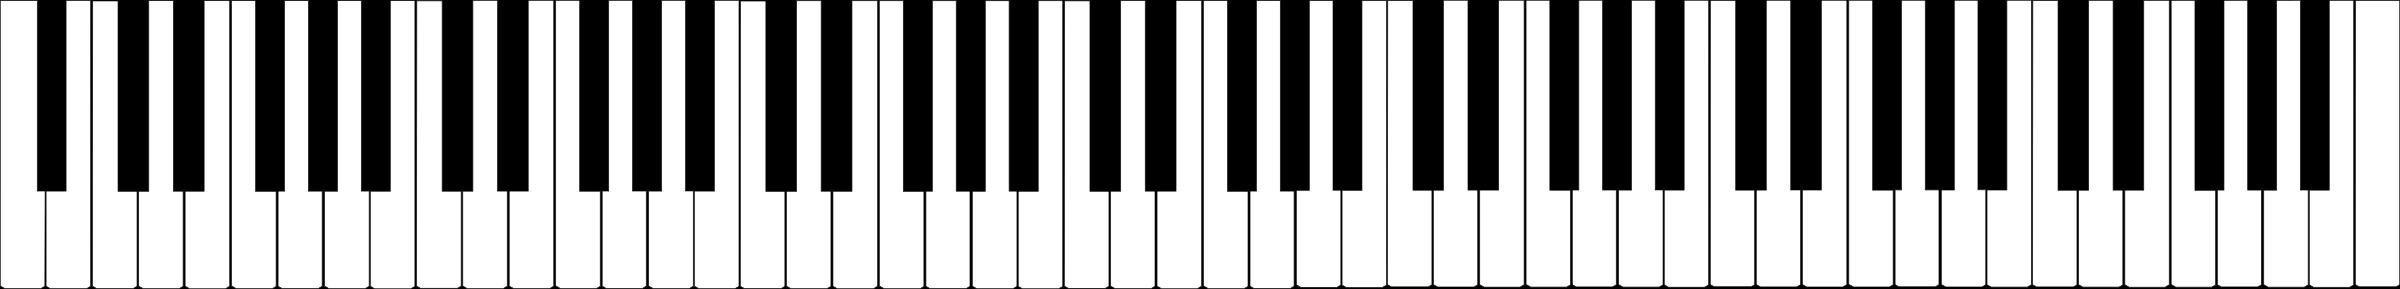 Standard key keyboard big. Piano clipart digital piano